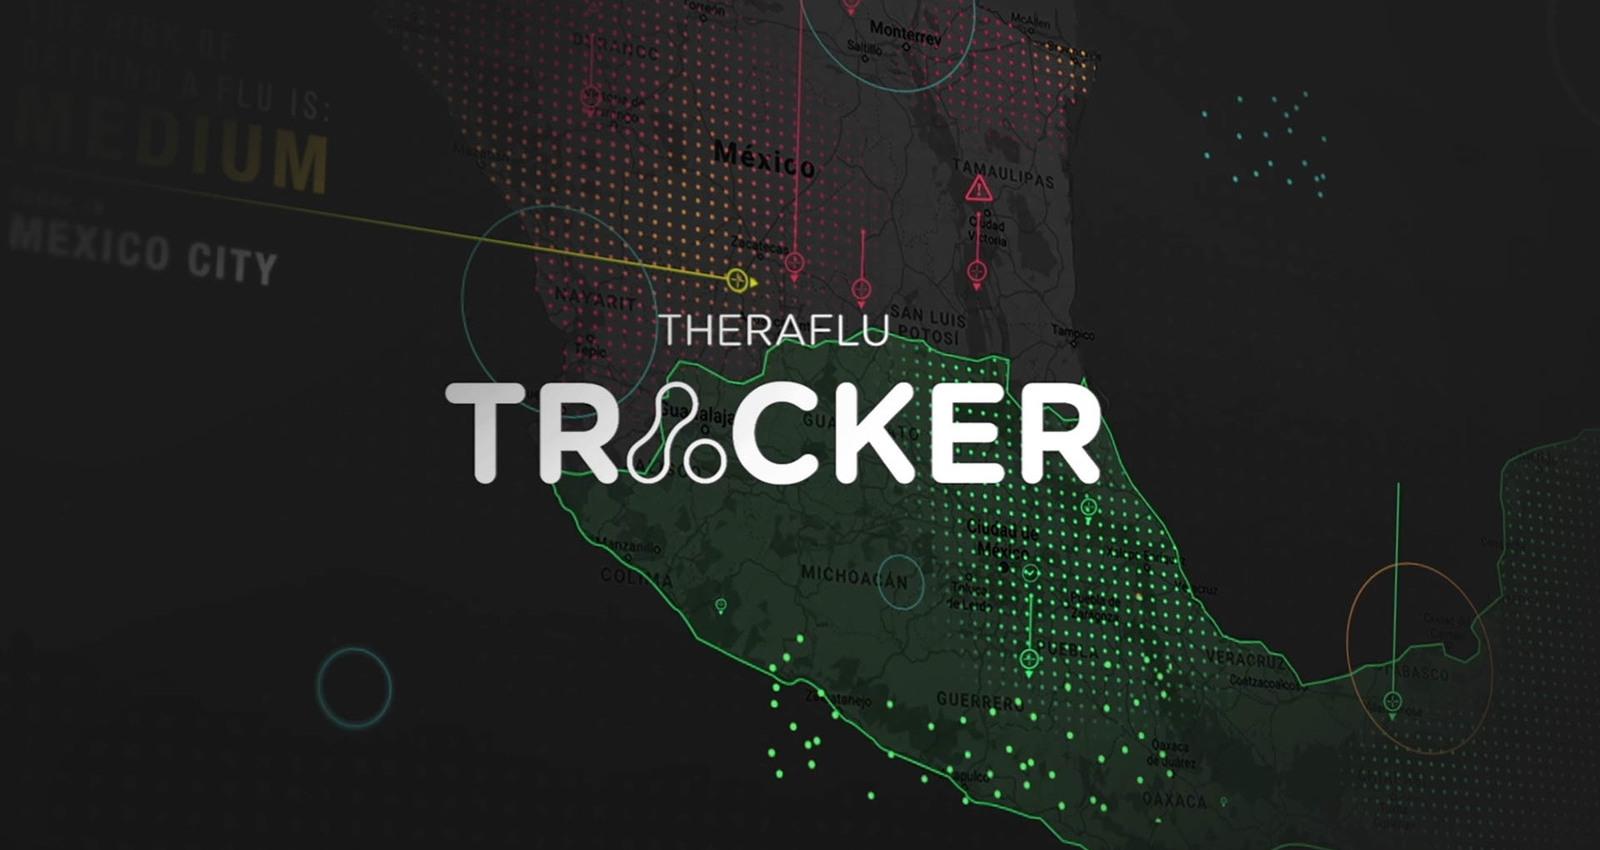 Theraflu-Tracker